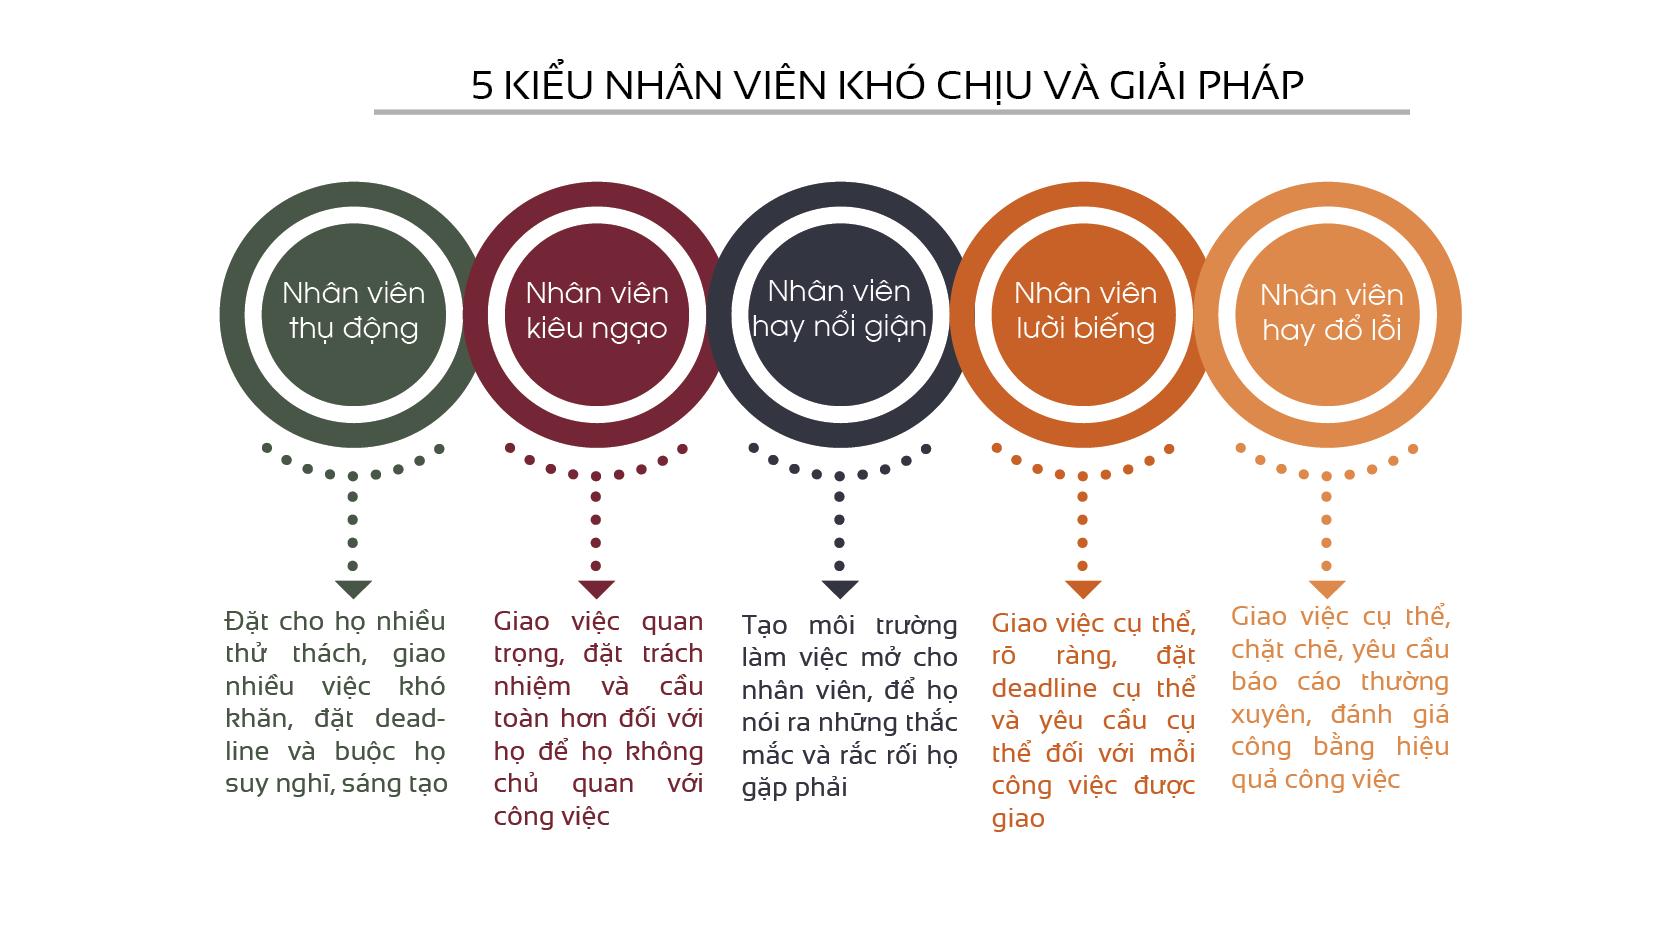 5 kieu nhan vien kho chiu va giai phap